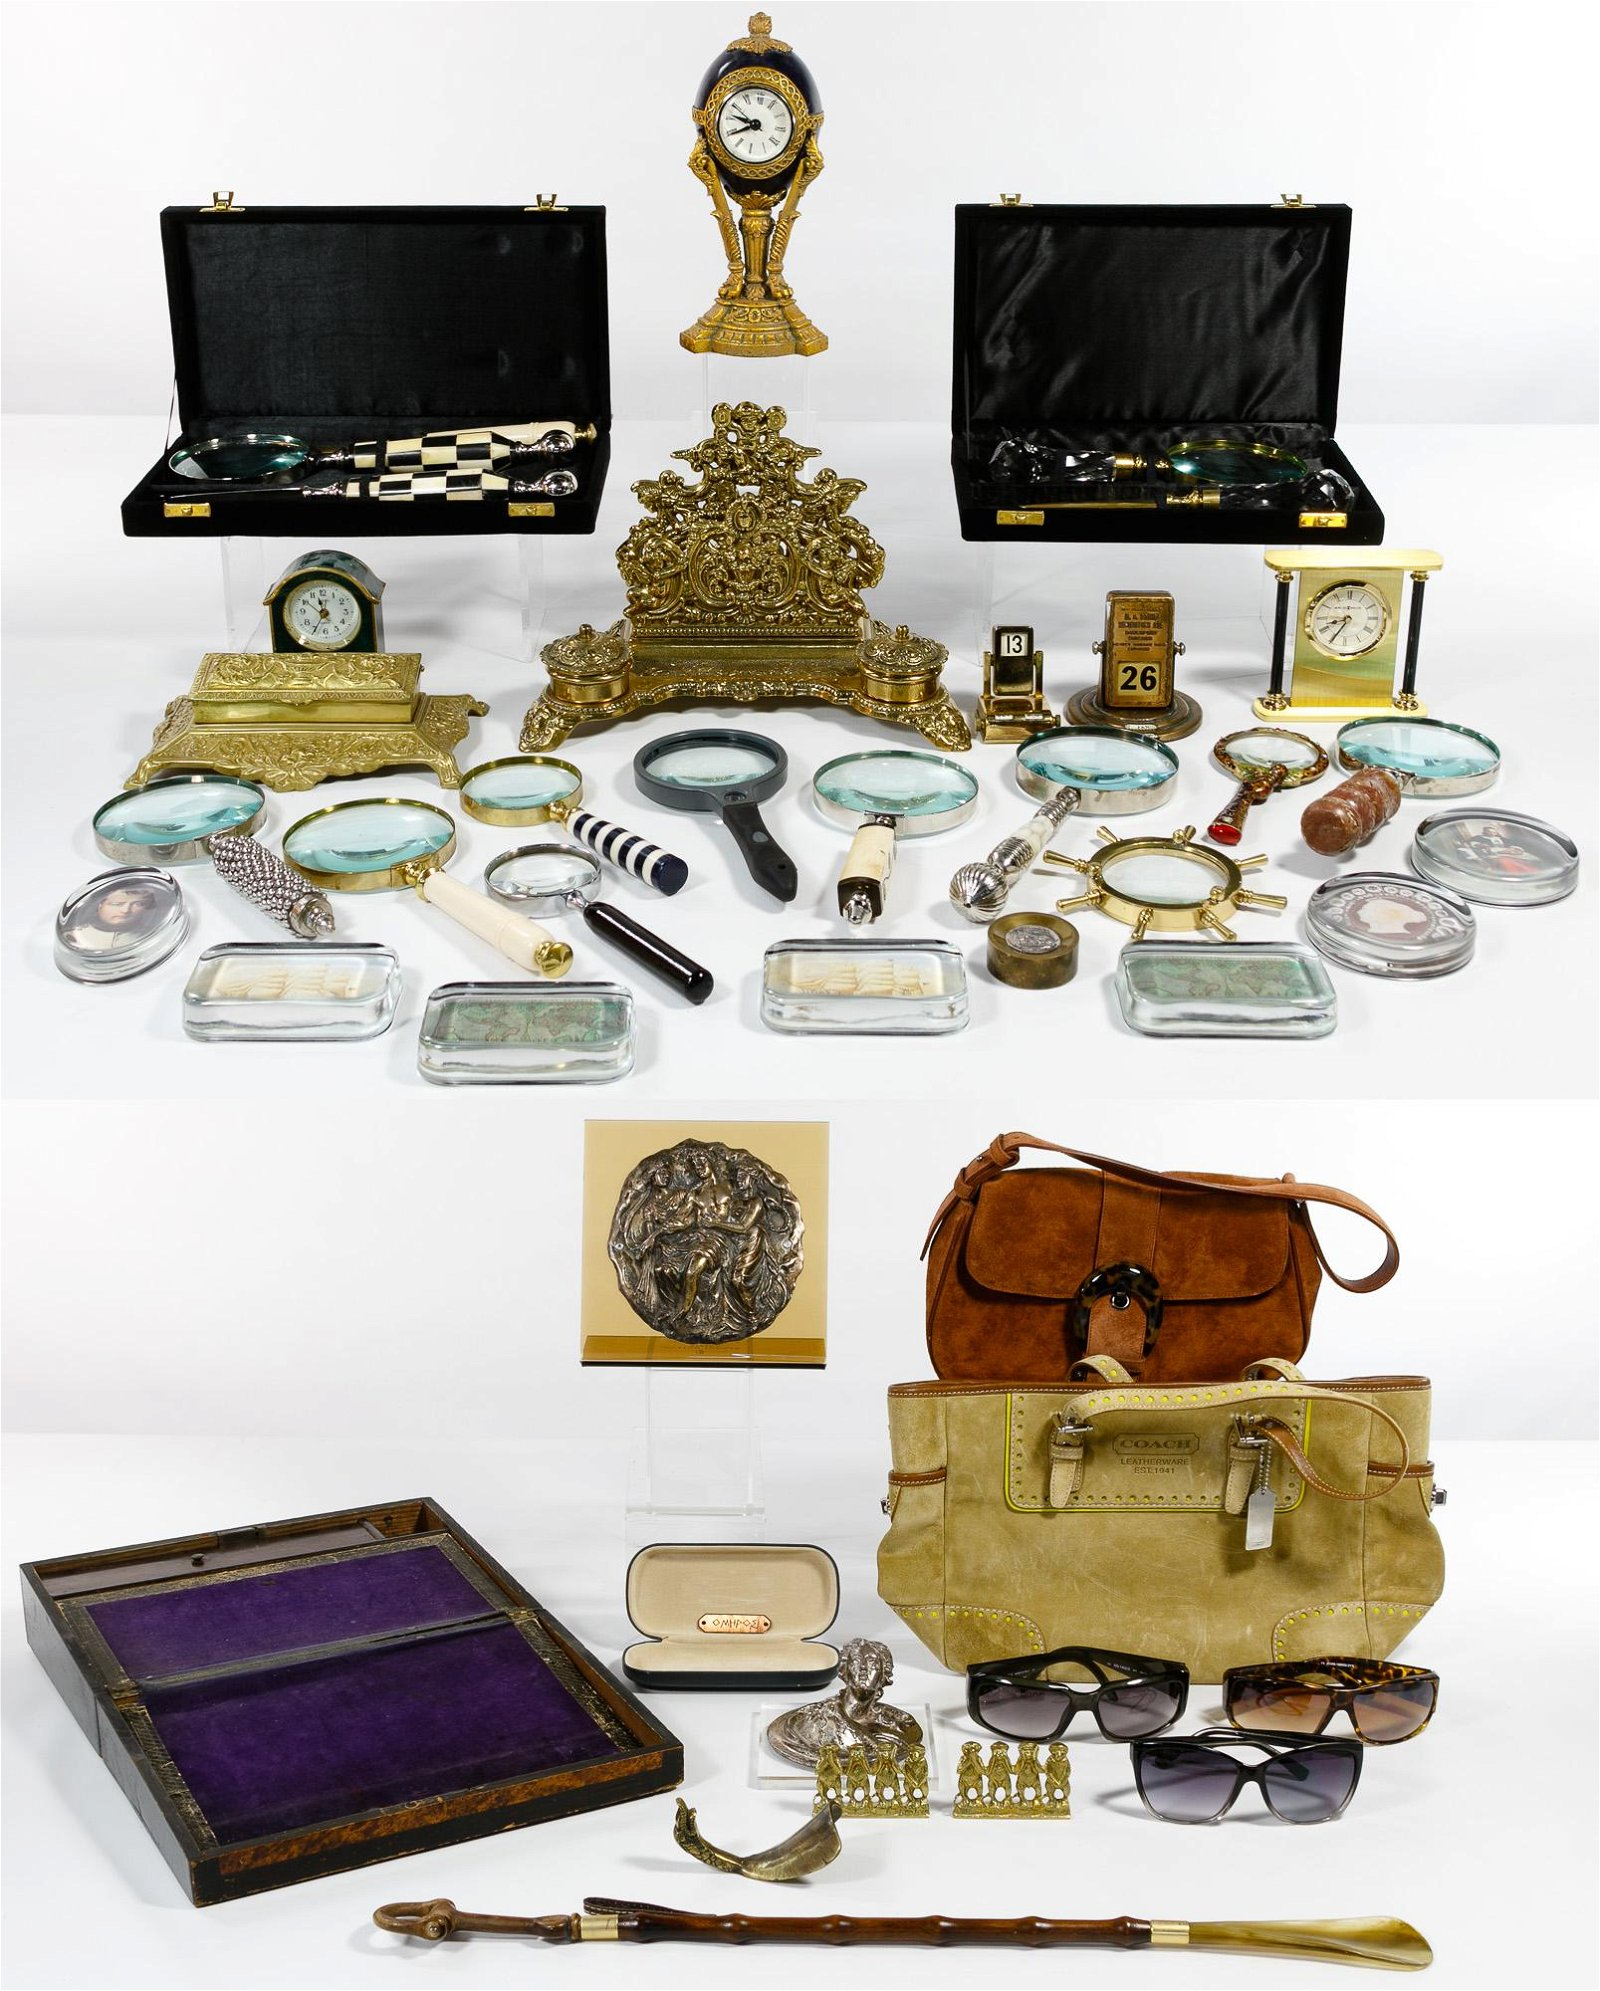 Desk and Fashion Accessory Assortment